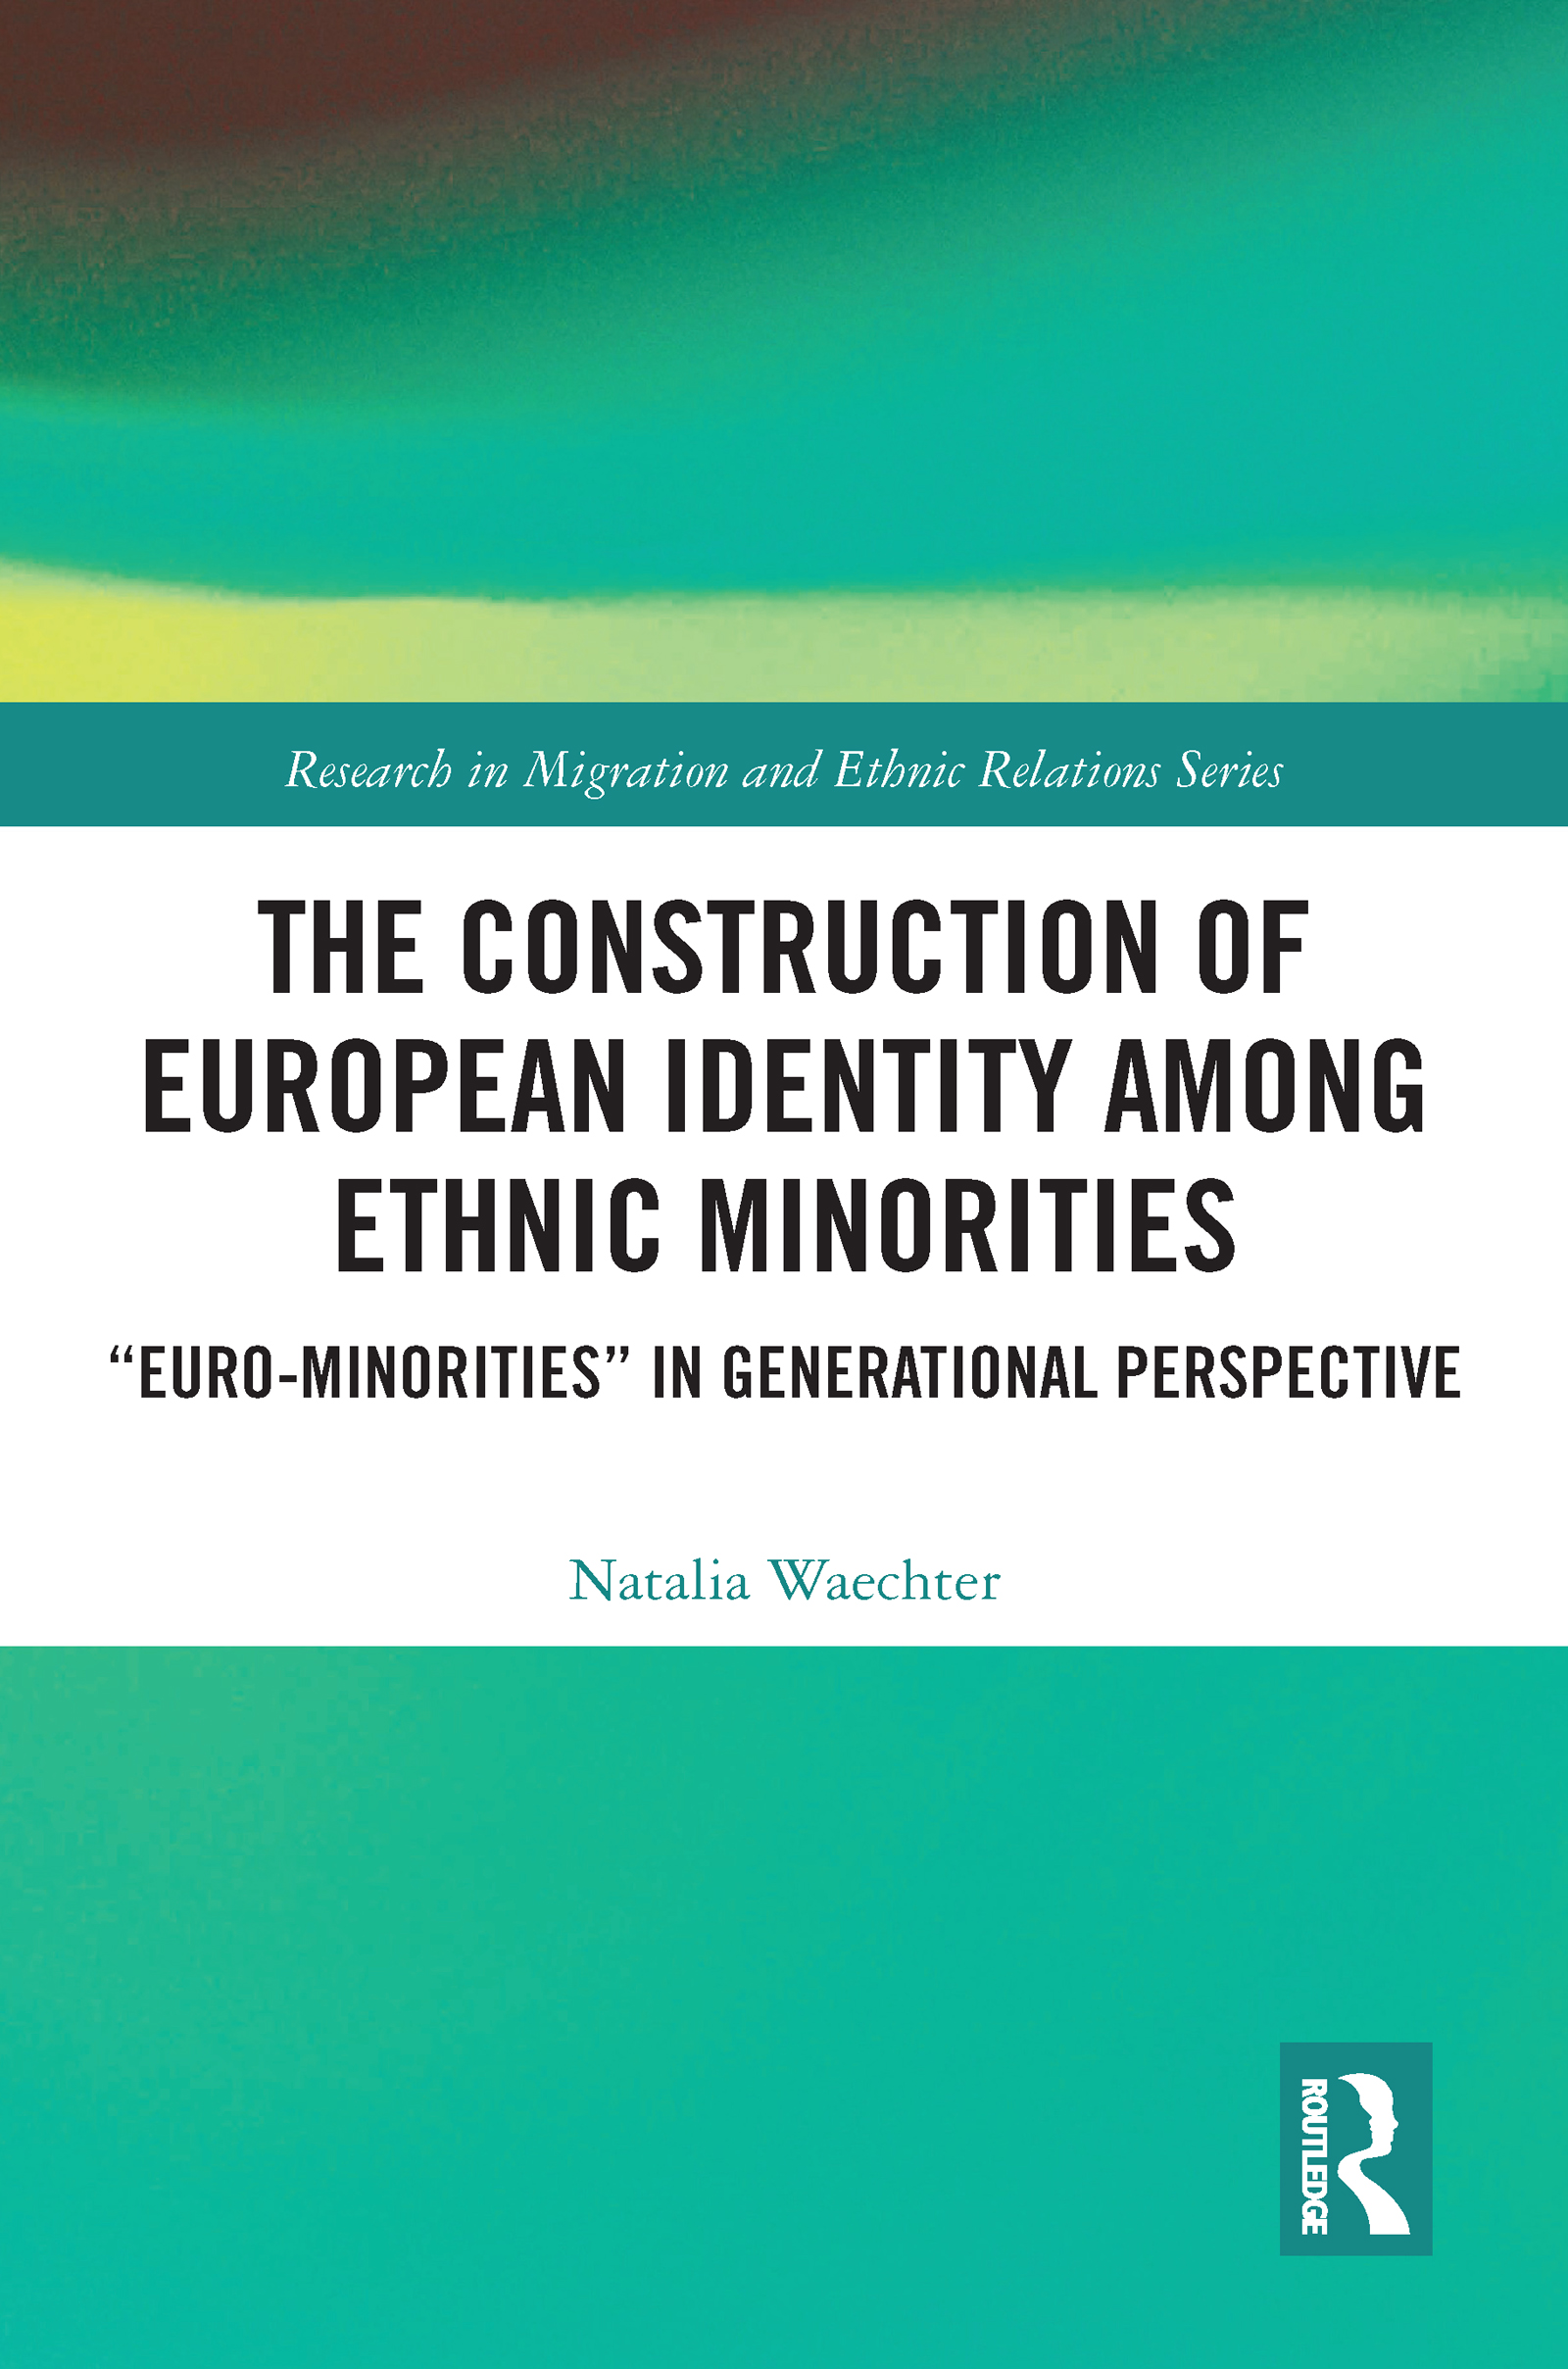 The Construction of European Identity among Ethnic Minorities